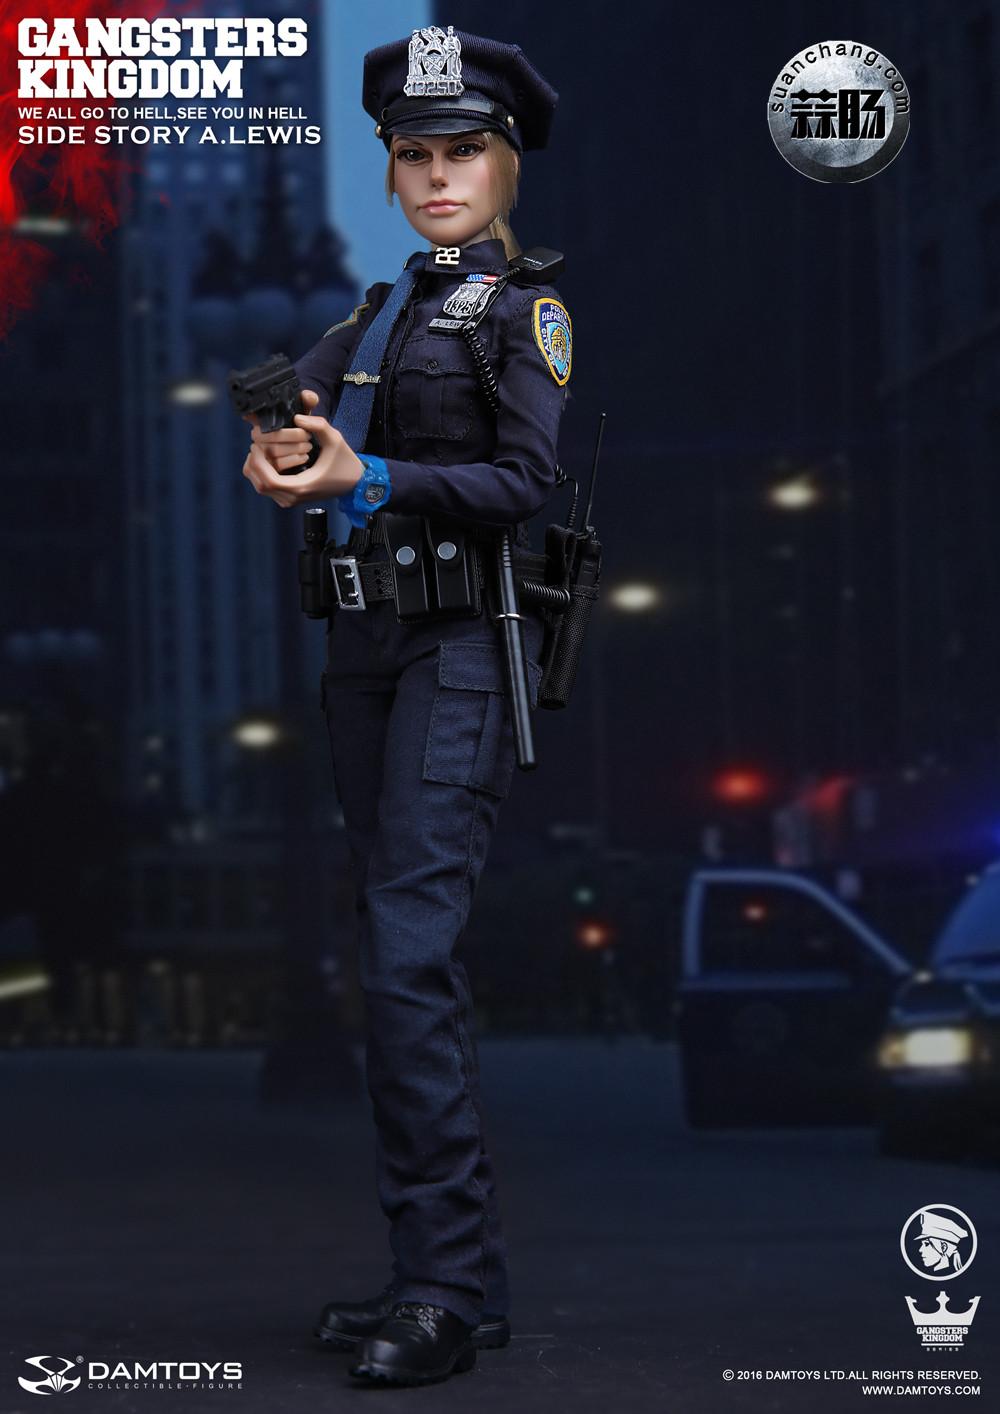 DAMTOYS 1/6黑帮王国系列 番外篇:安妮·刘易斯 警官 模玩 第4张